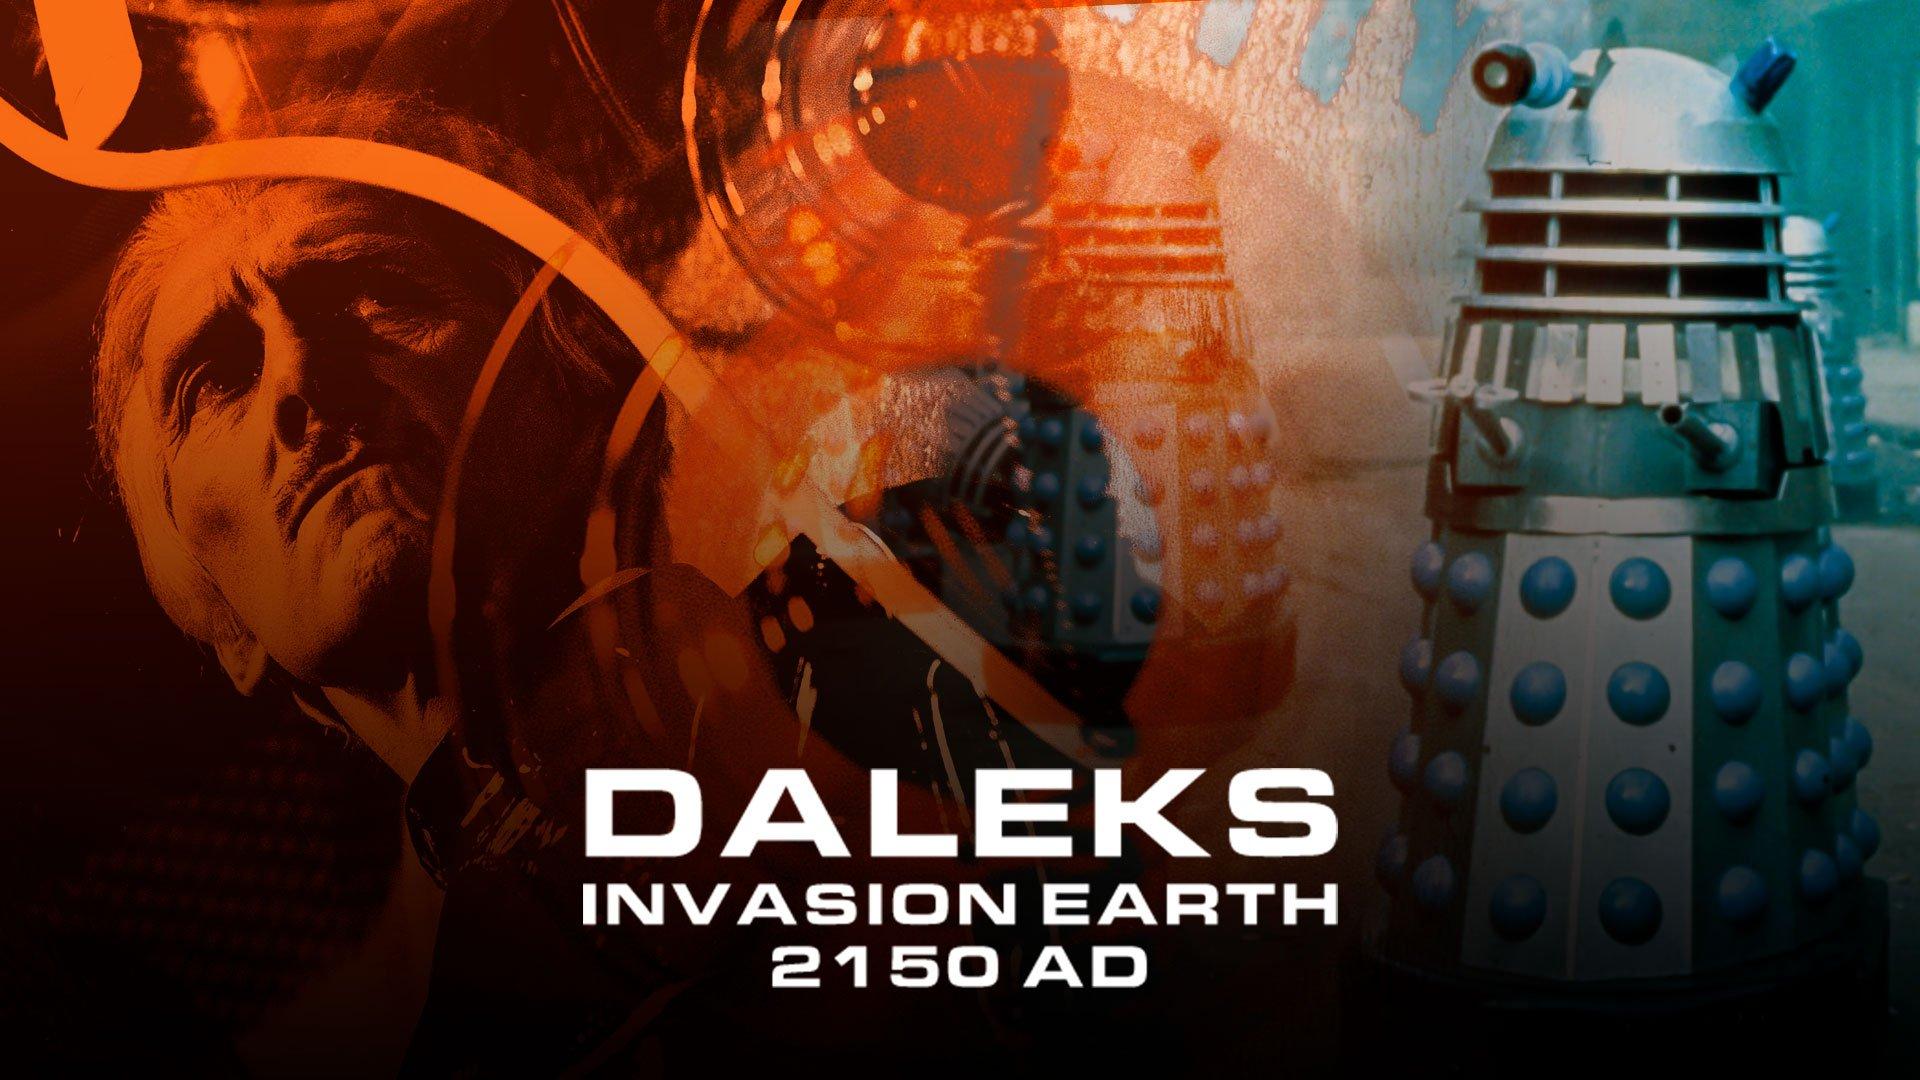 Daleks' Invasion Earth 2150 A.D on BritBox UK